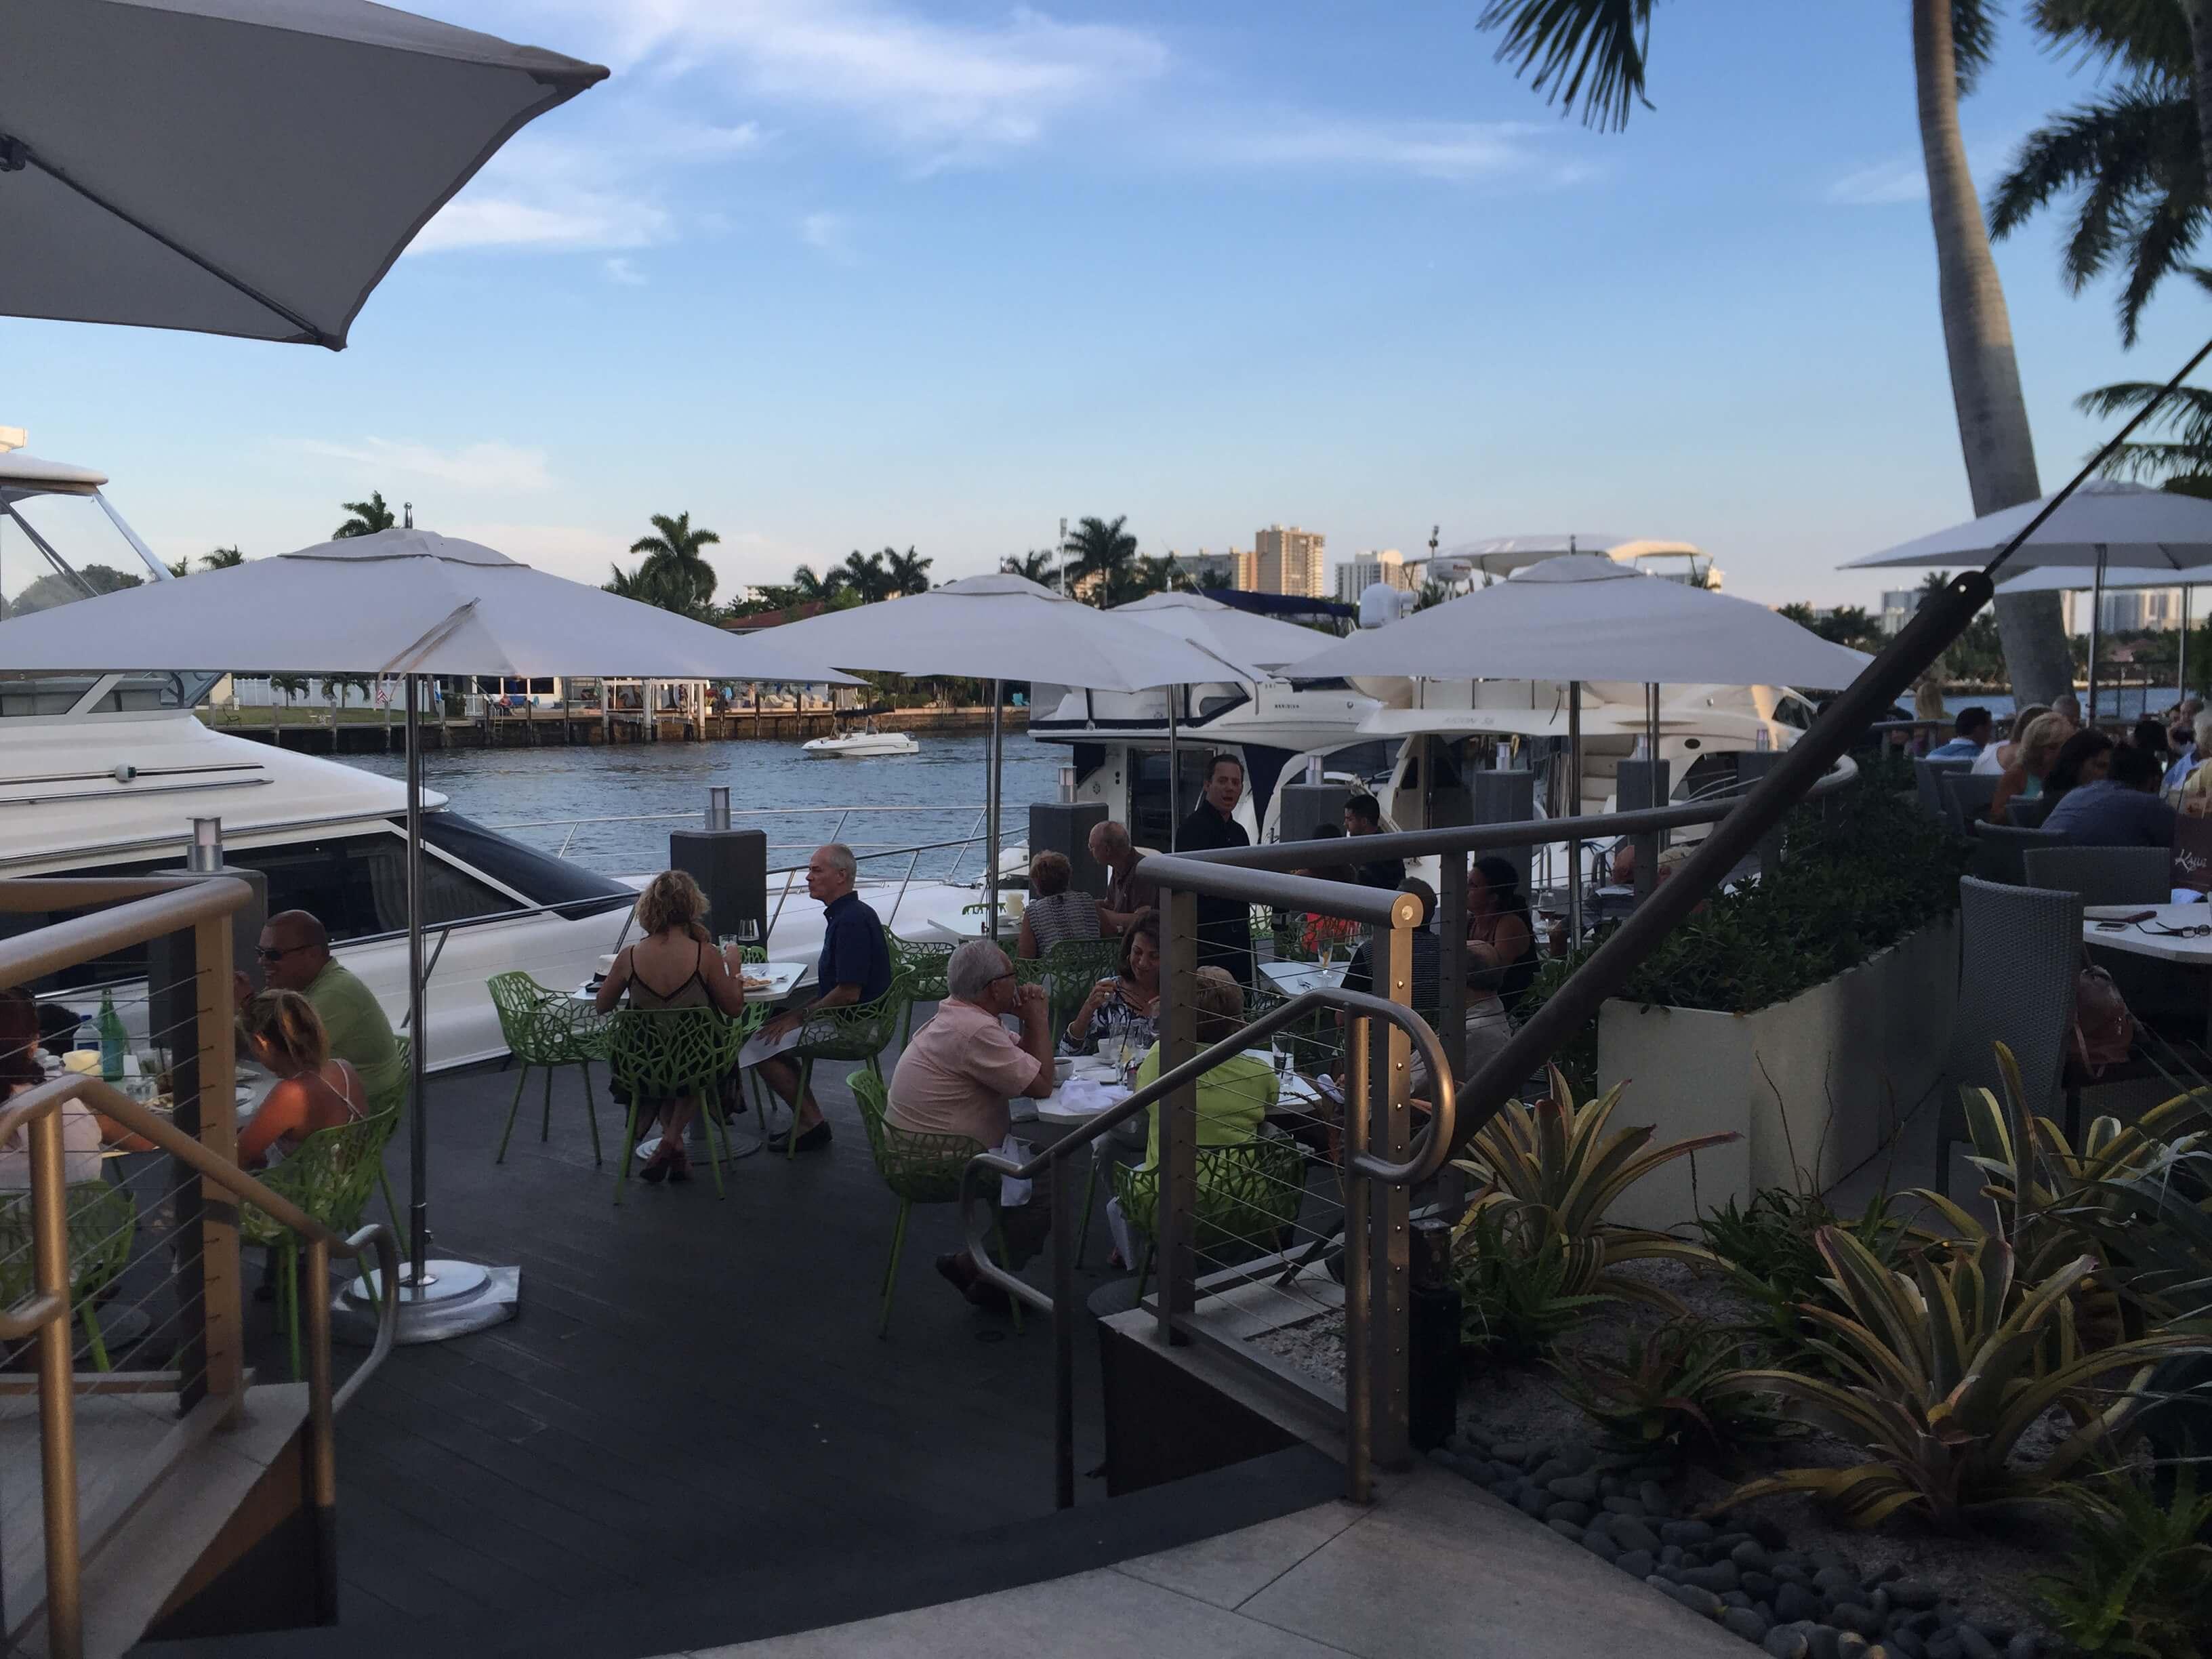 Kaluz Restau Outdoor Dining Fort Lauderdale